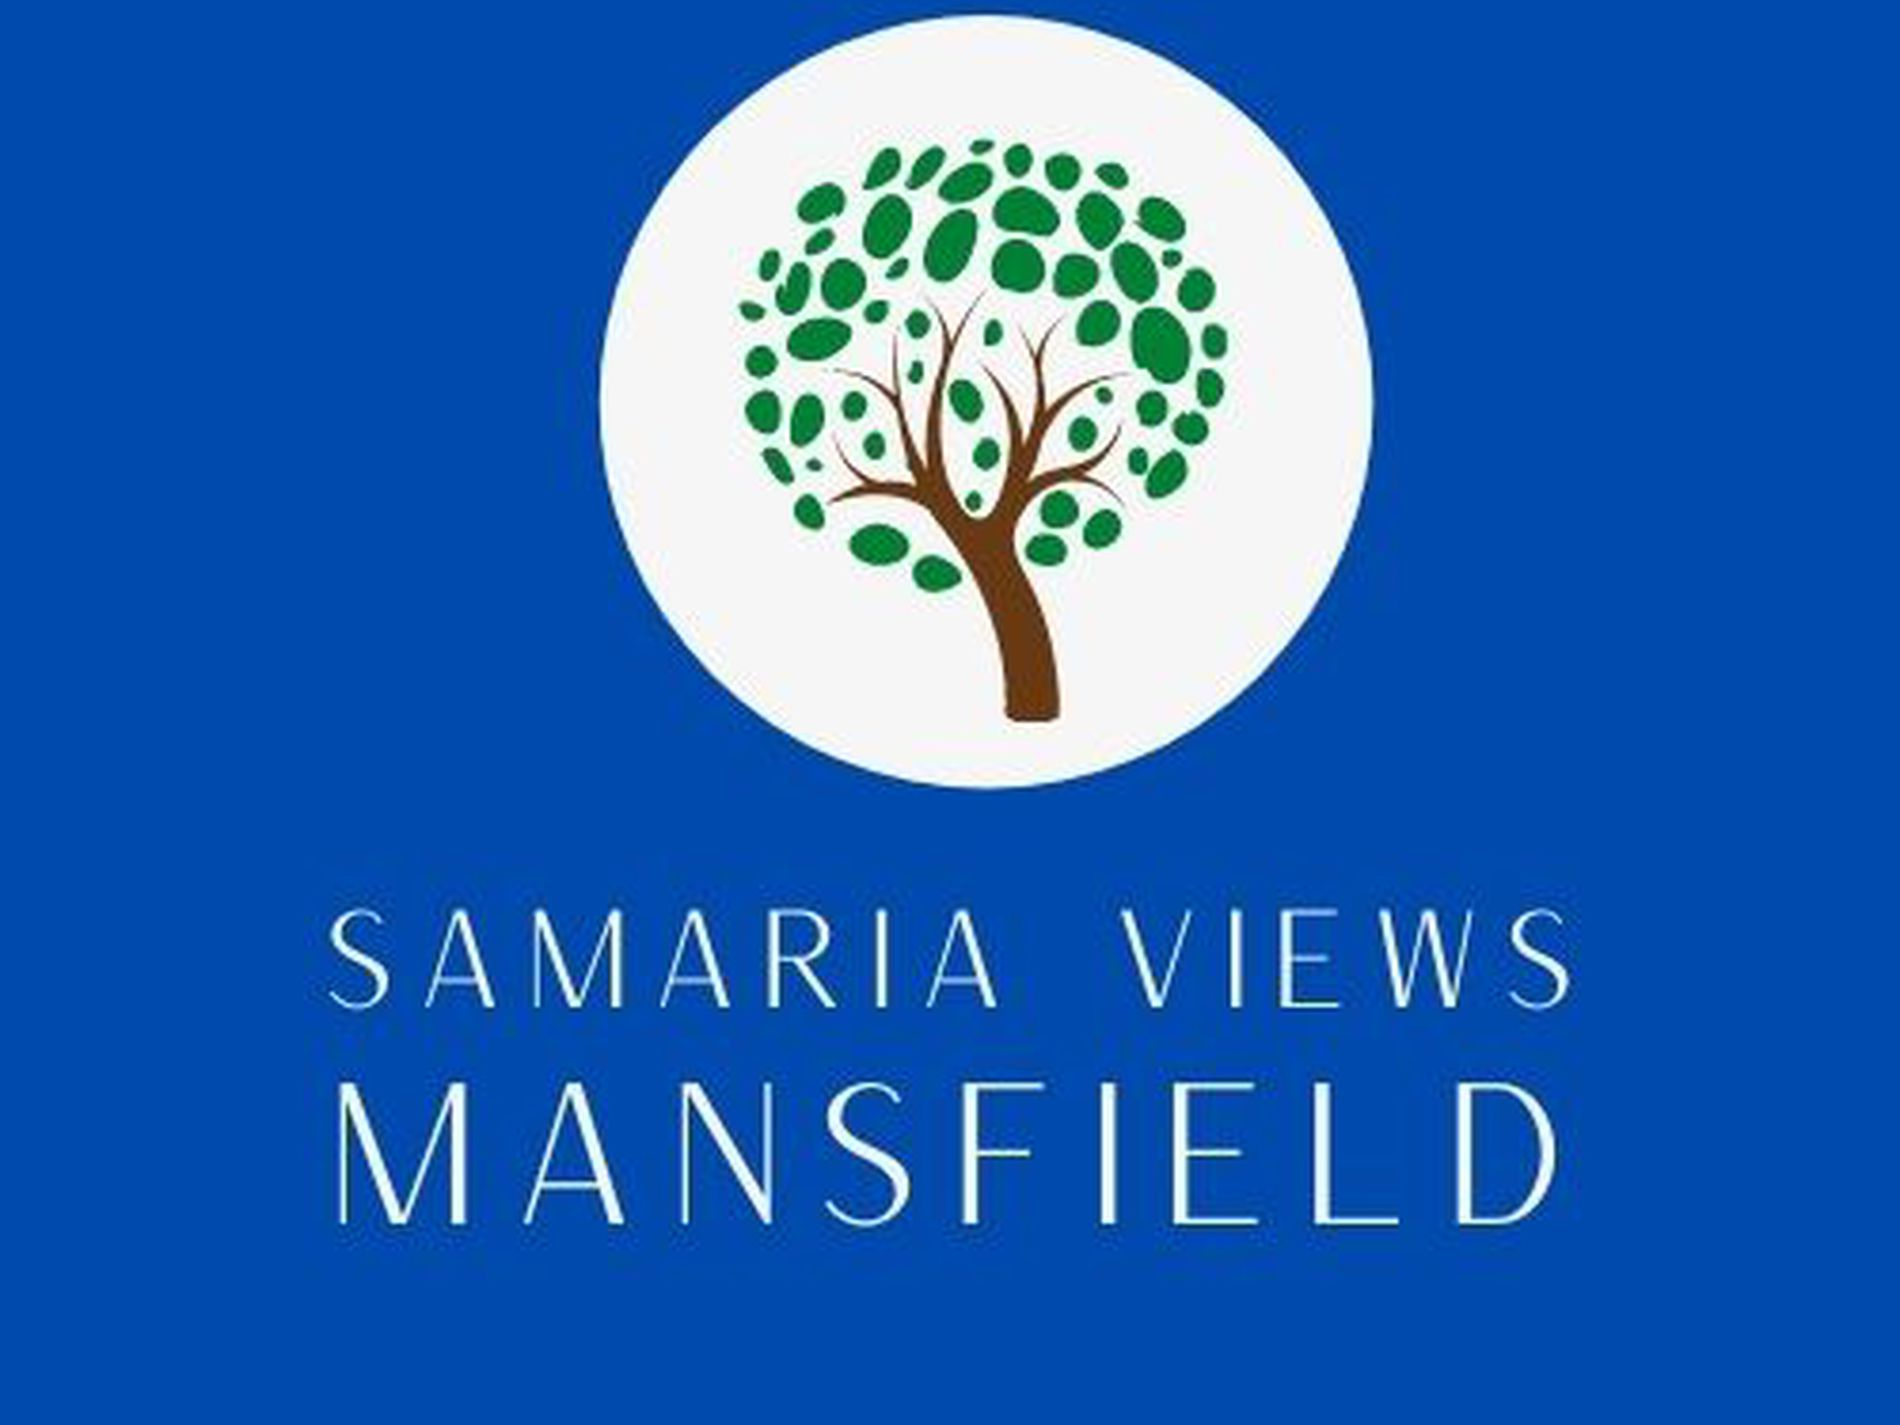 Lot 102, Samaria Views, Mansfield